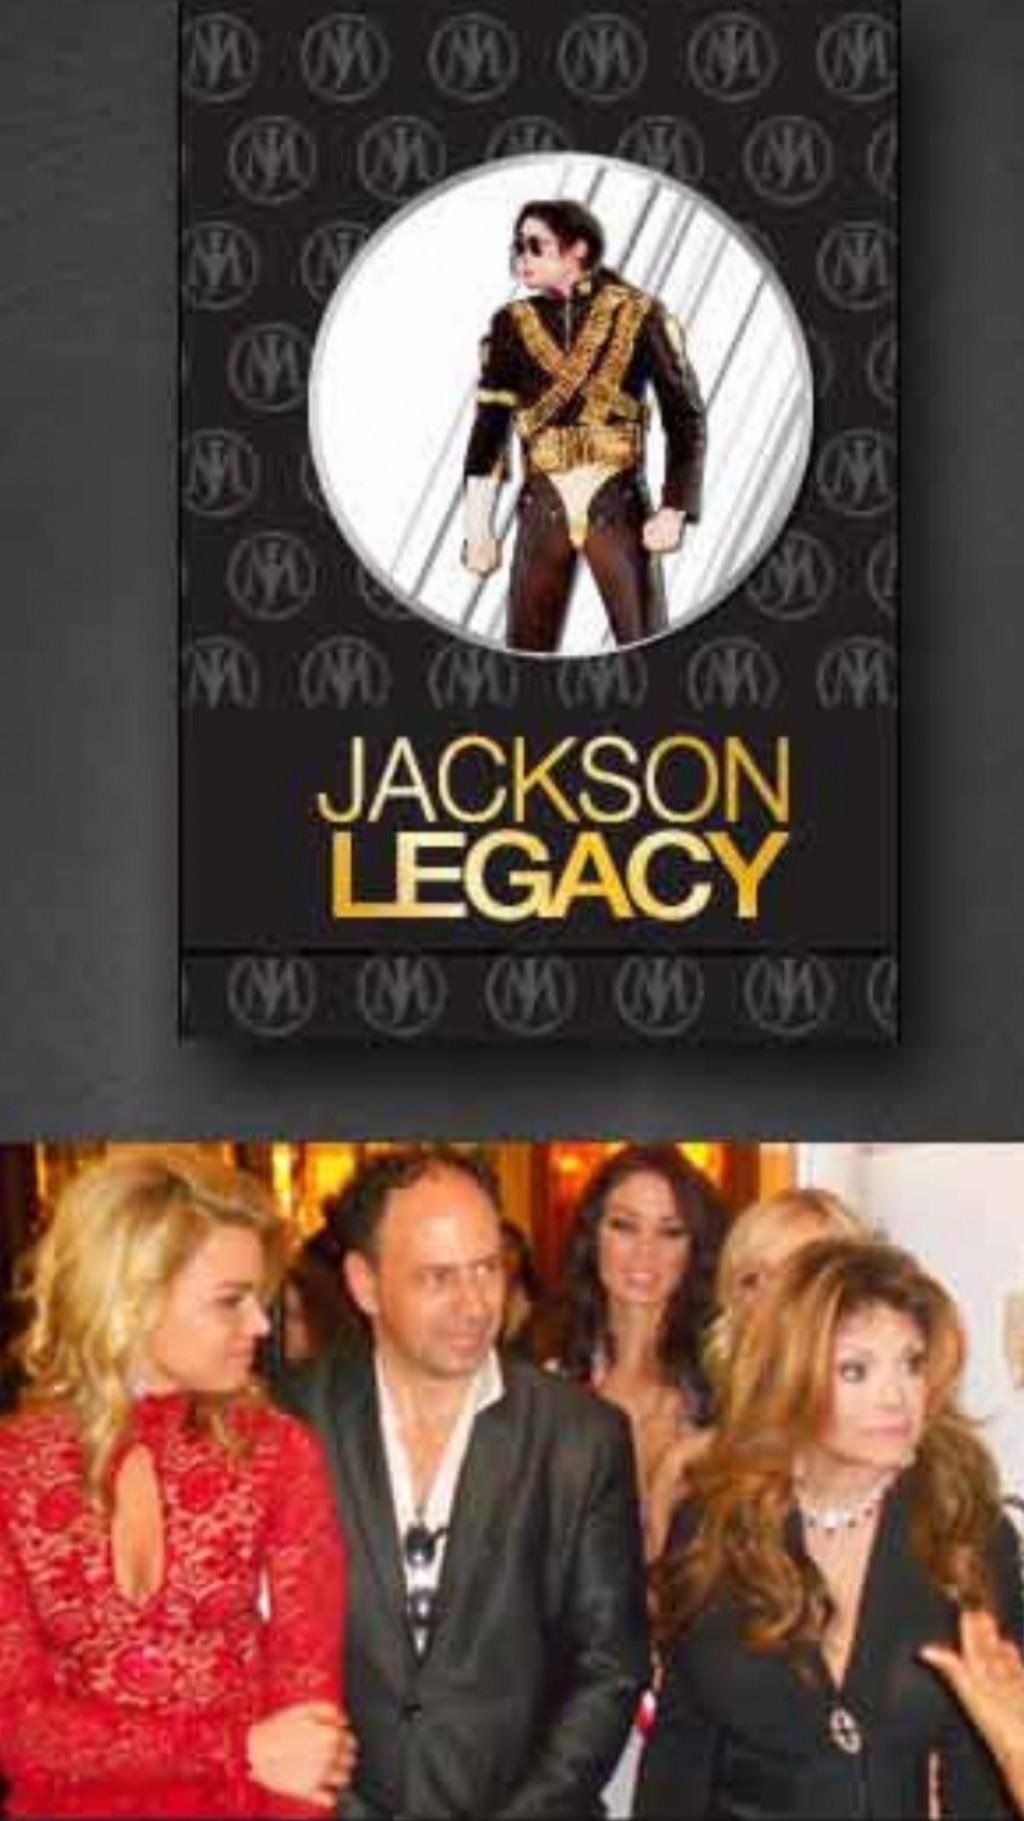 Jackson Legacy